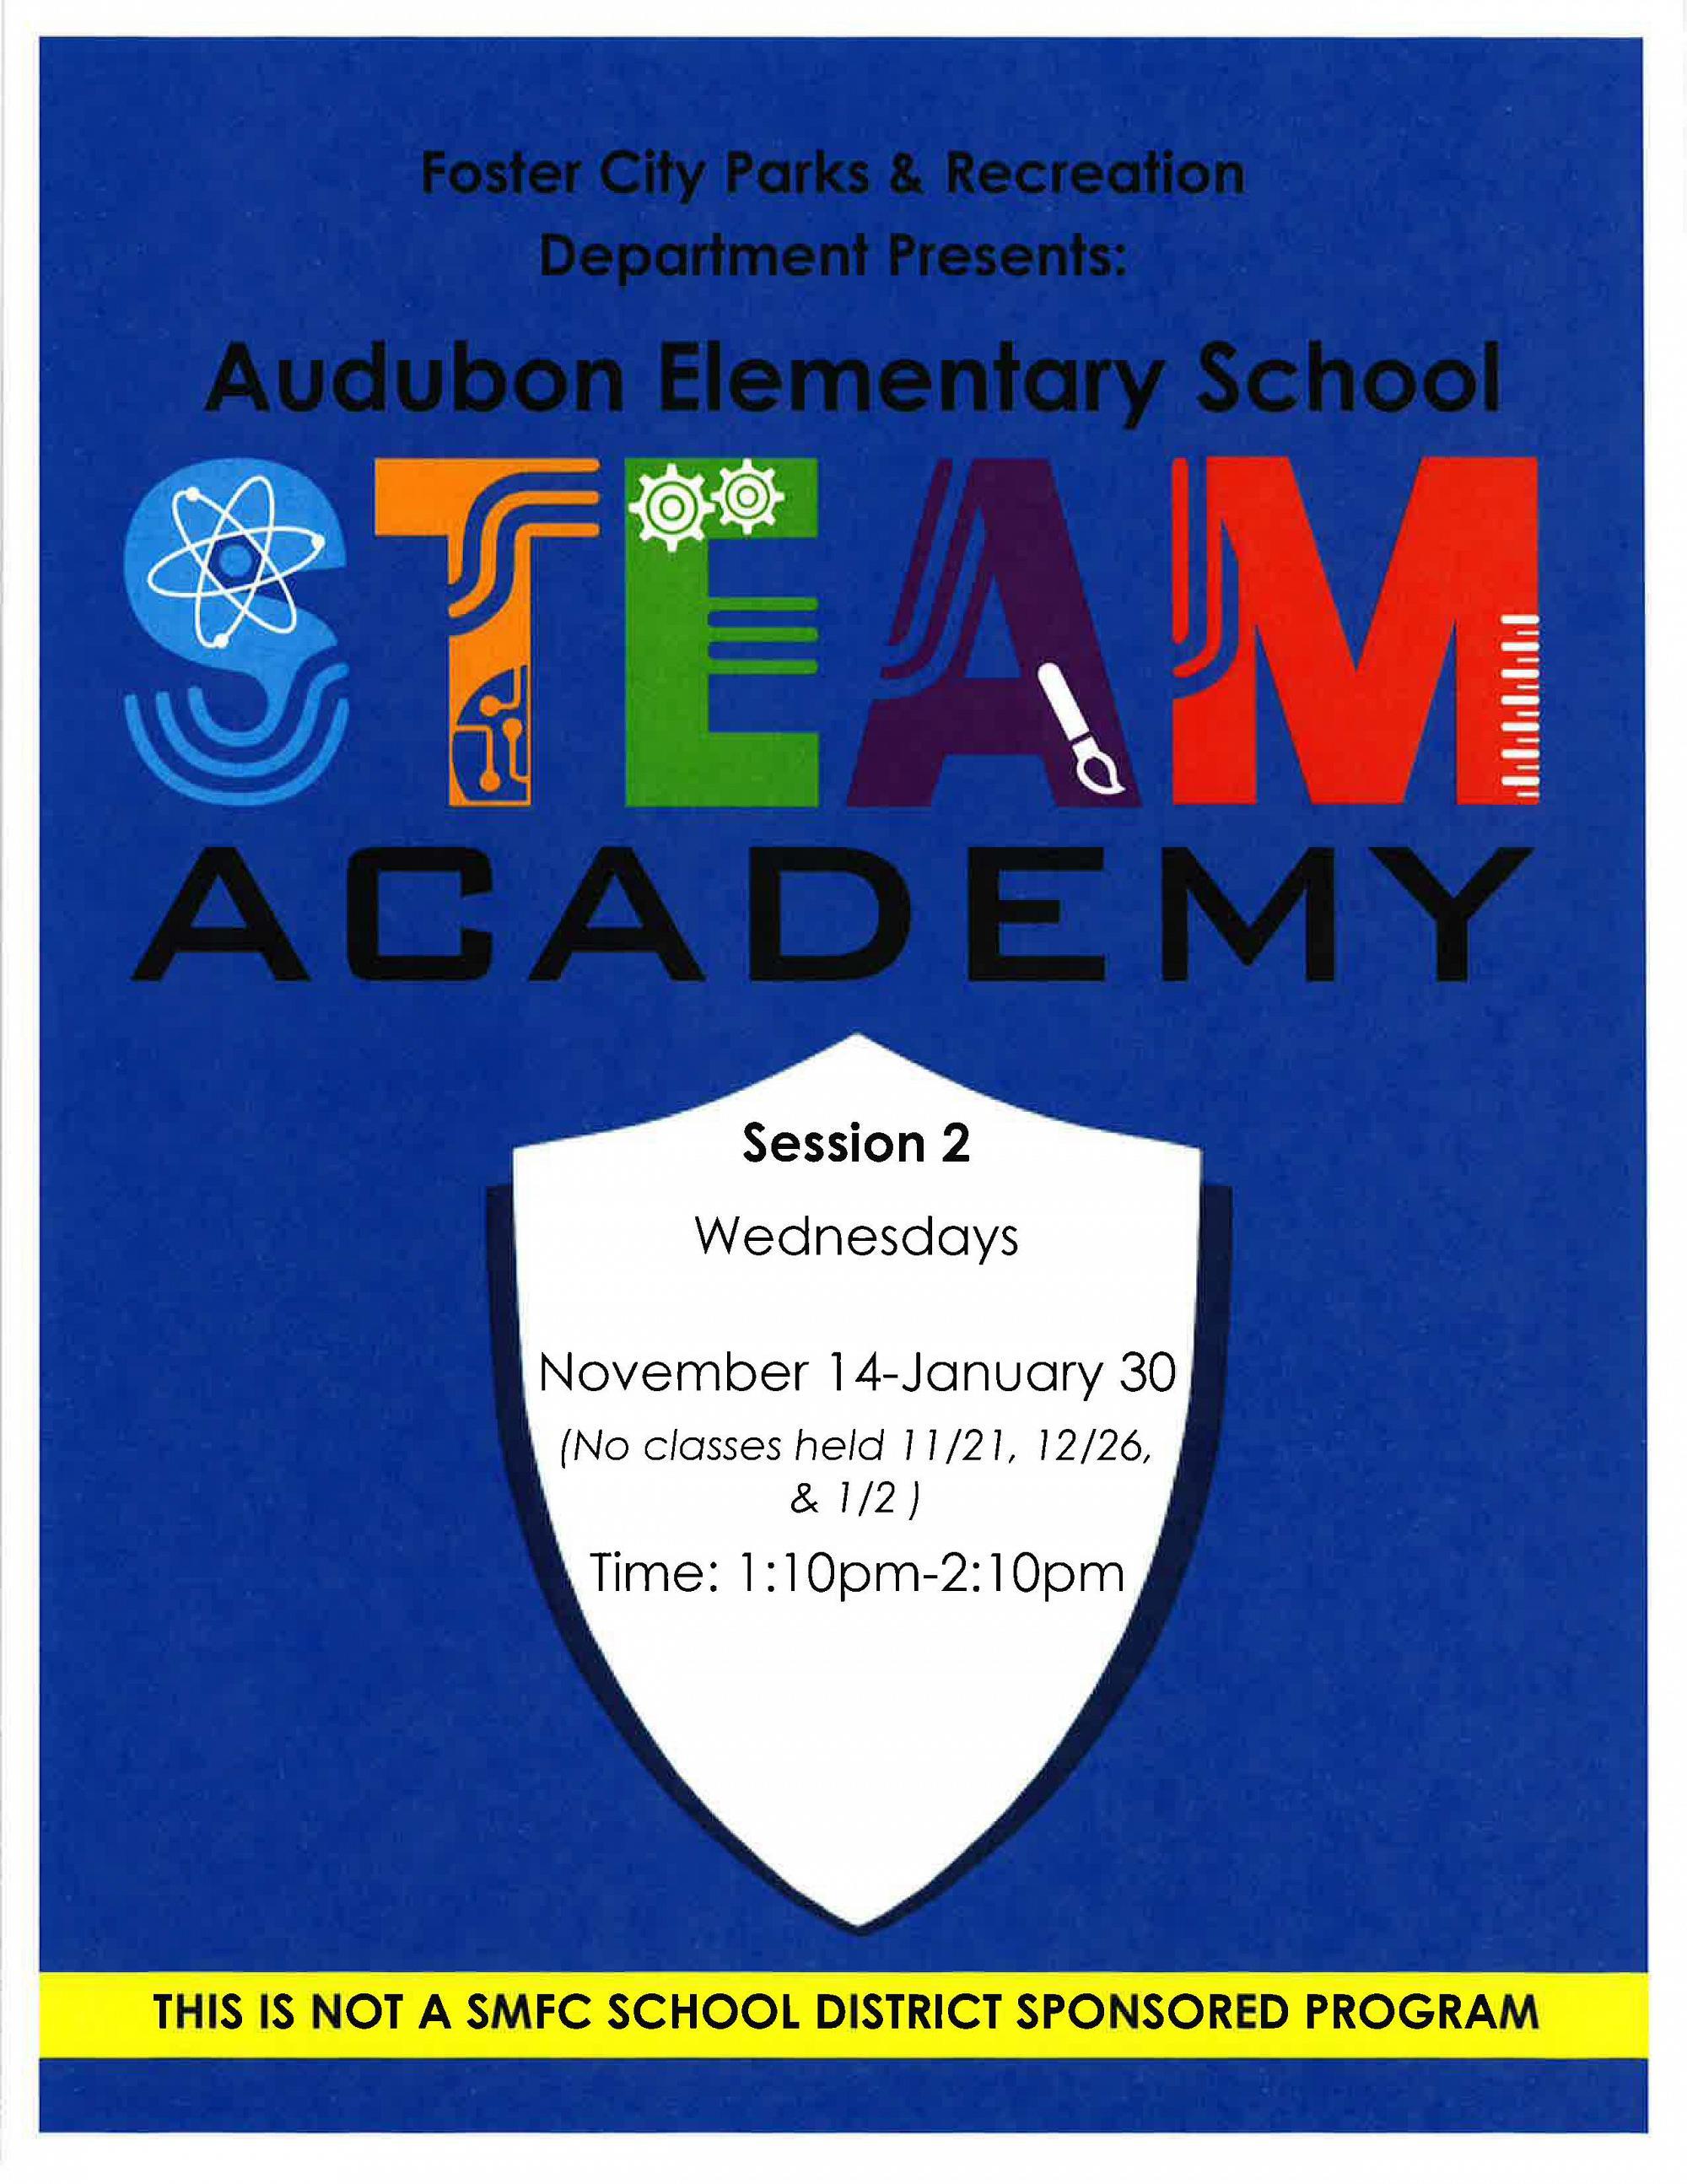 Audubon Elementary School - Home Throughout Audubon Calendars 2021 Foster City